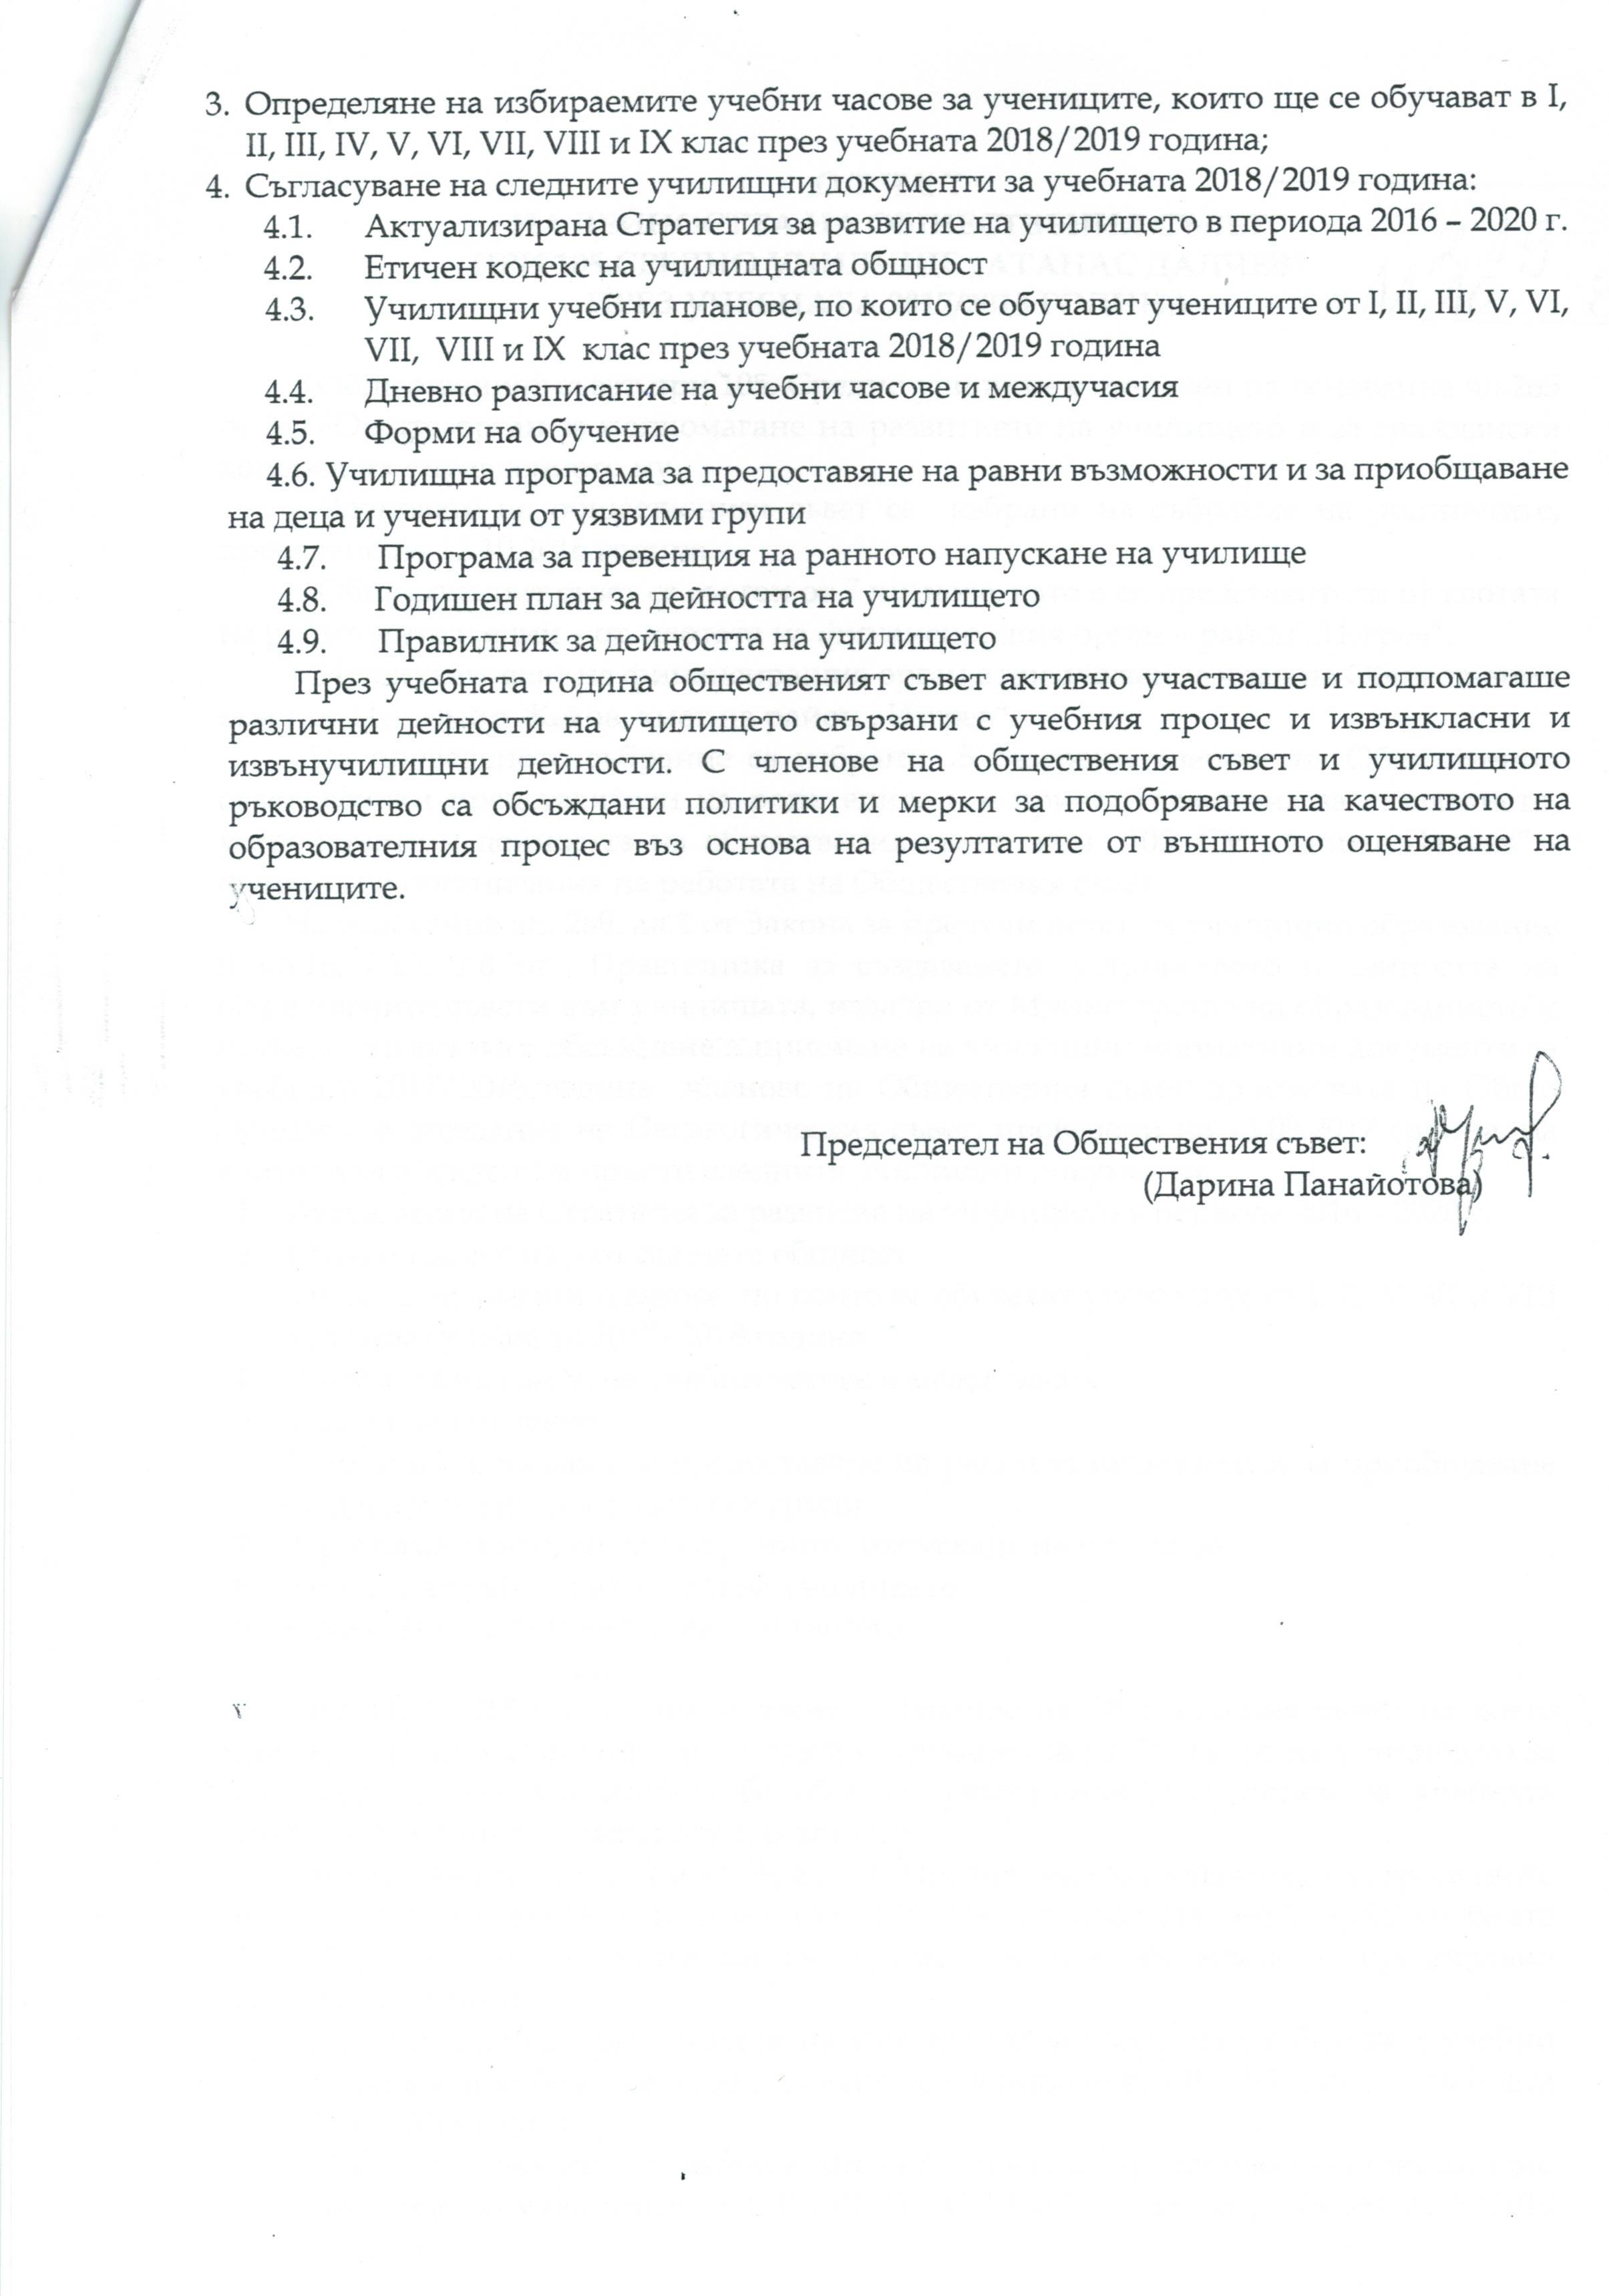 CCF11102018_00004